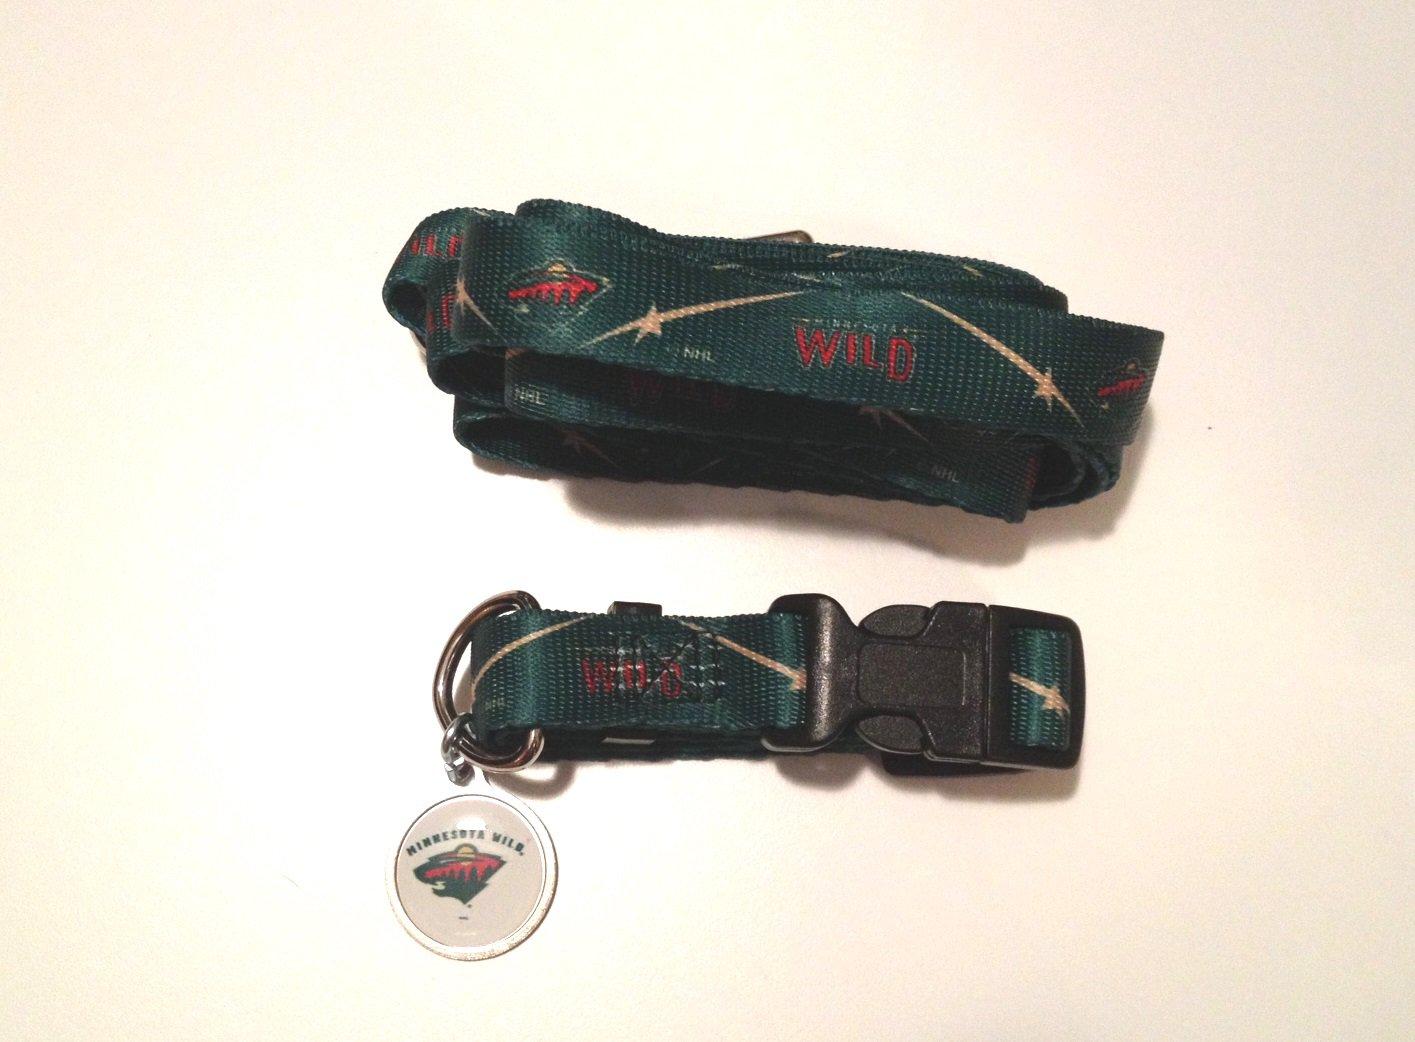 Minnesota Wild Pet Dog Leash Set Collar ID Tag Small